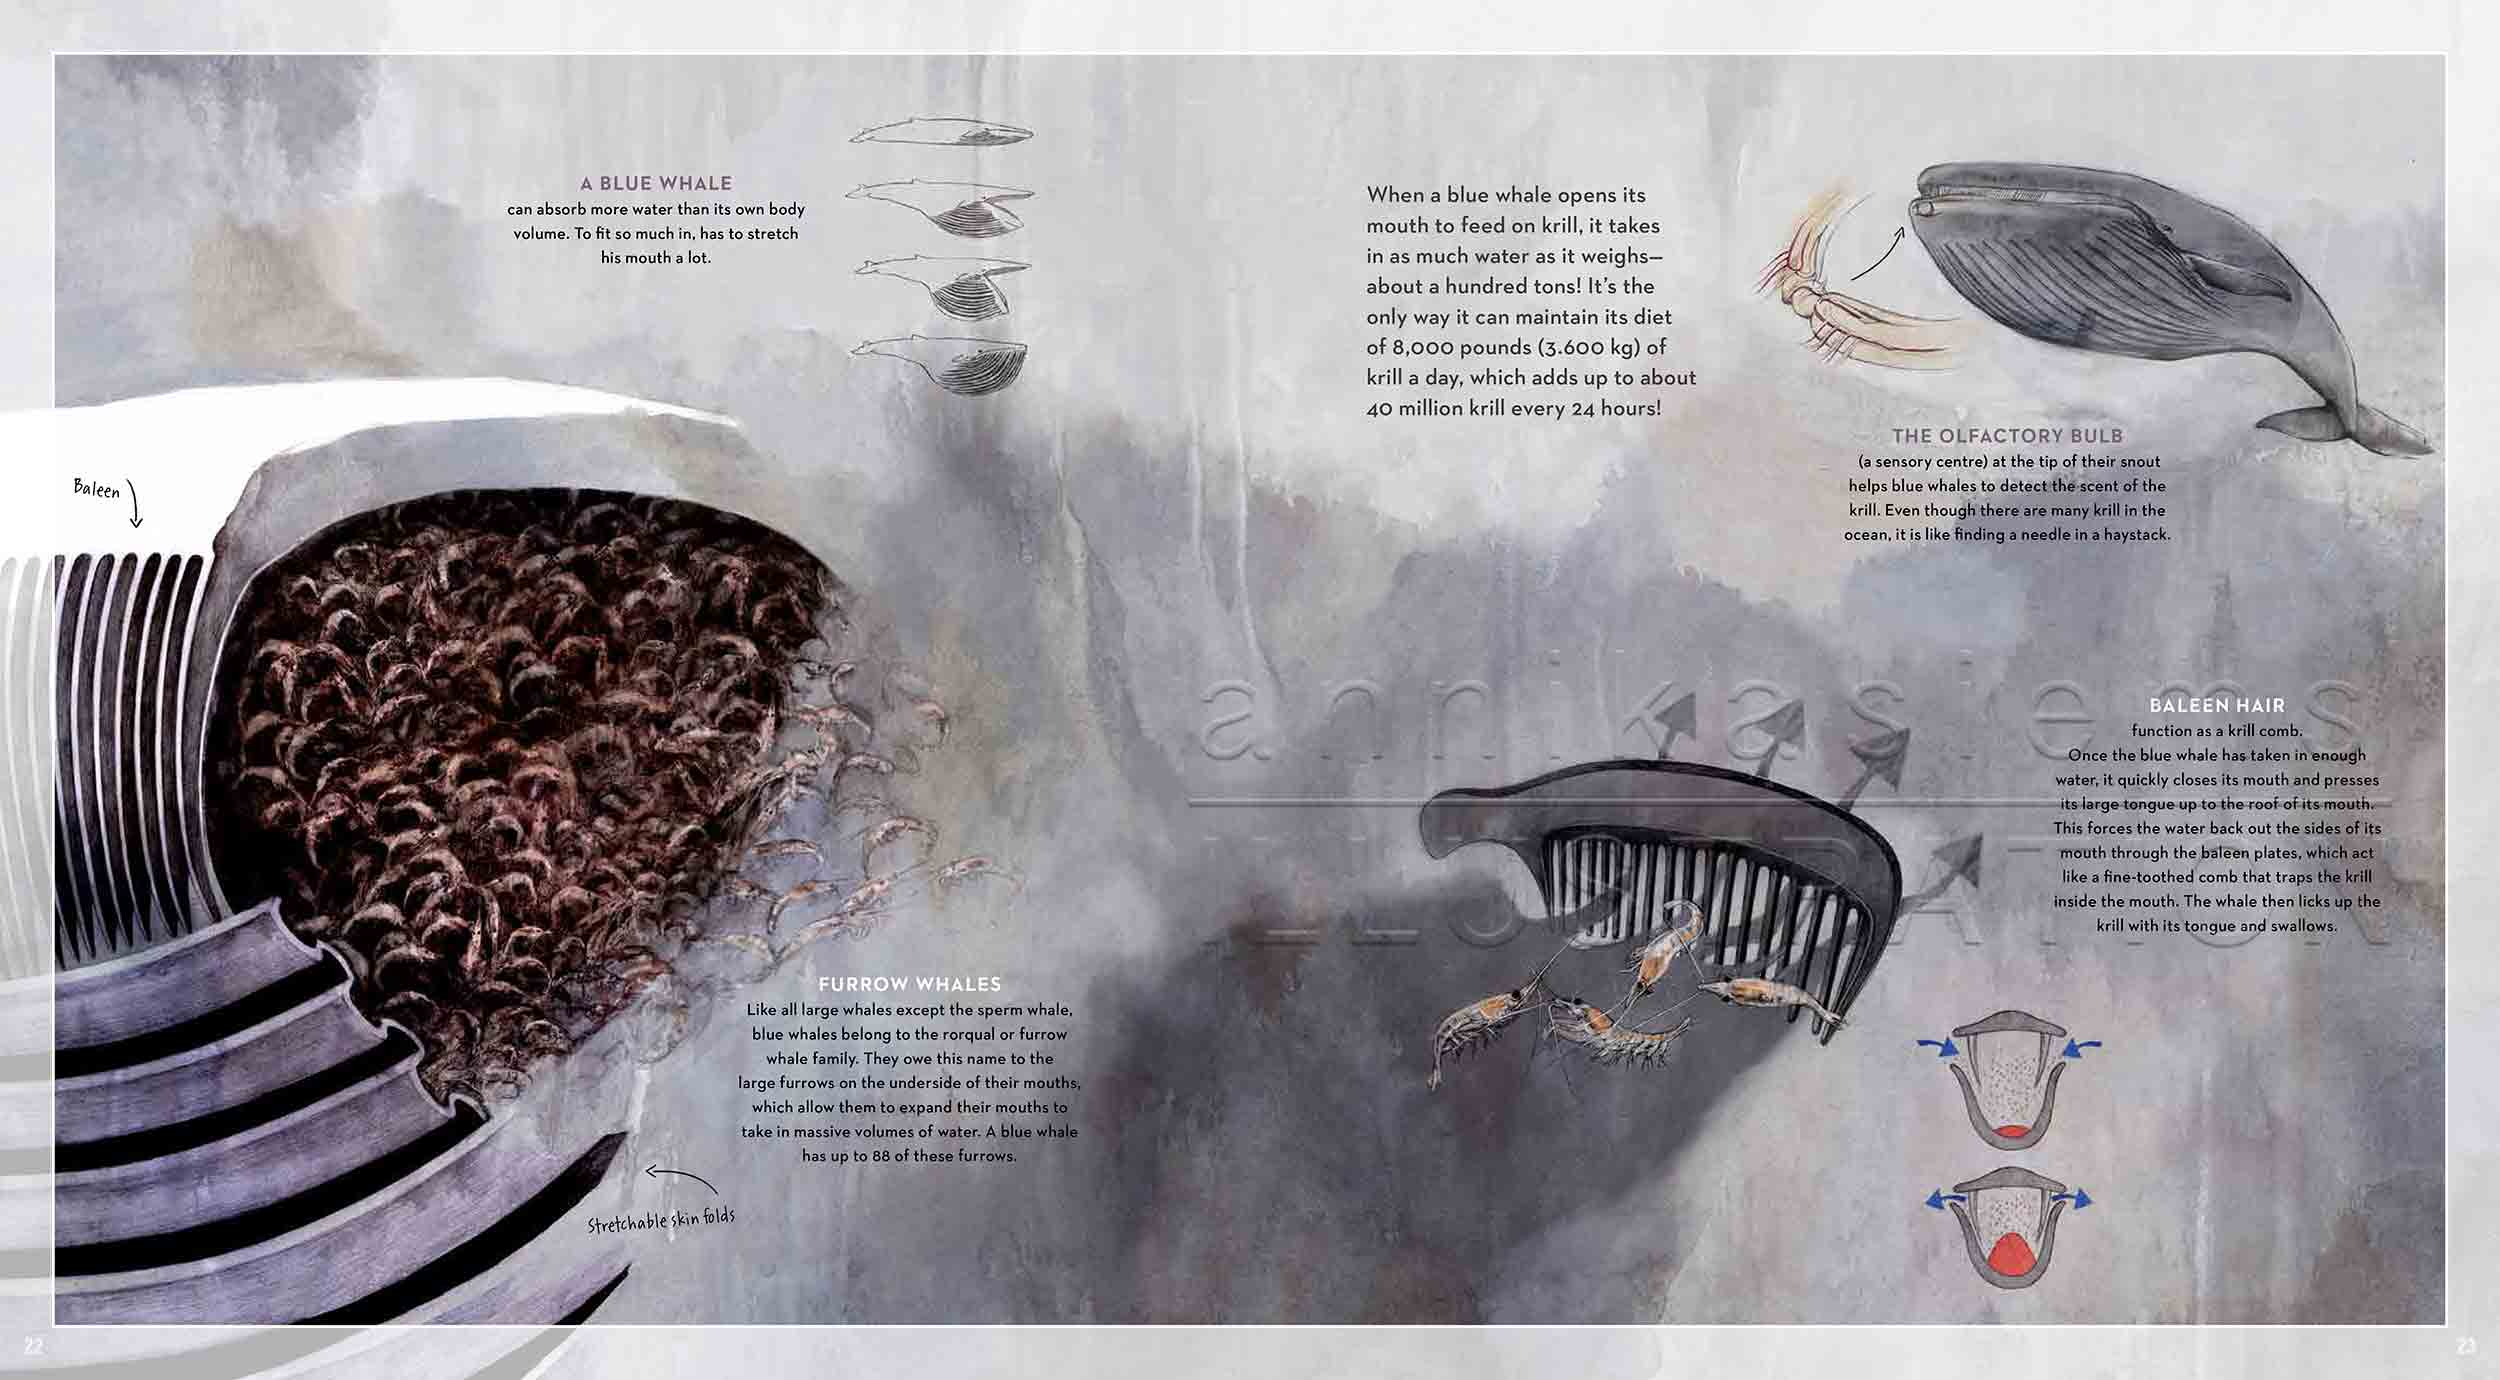 22-23-deep-sea-Englisch-infografic-baleen-bluewhale-krill-©annikasiems-plankton_deepsea-zooplankton.jpg